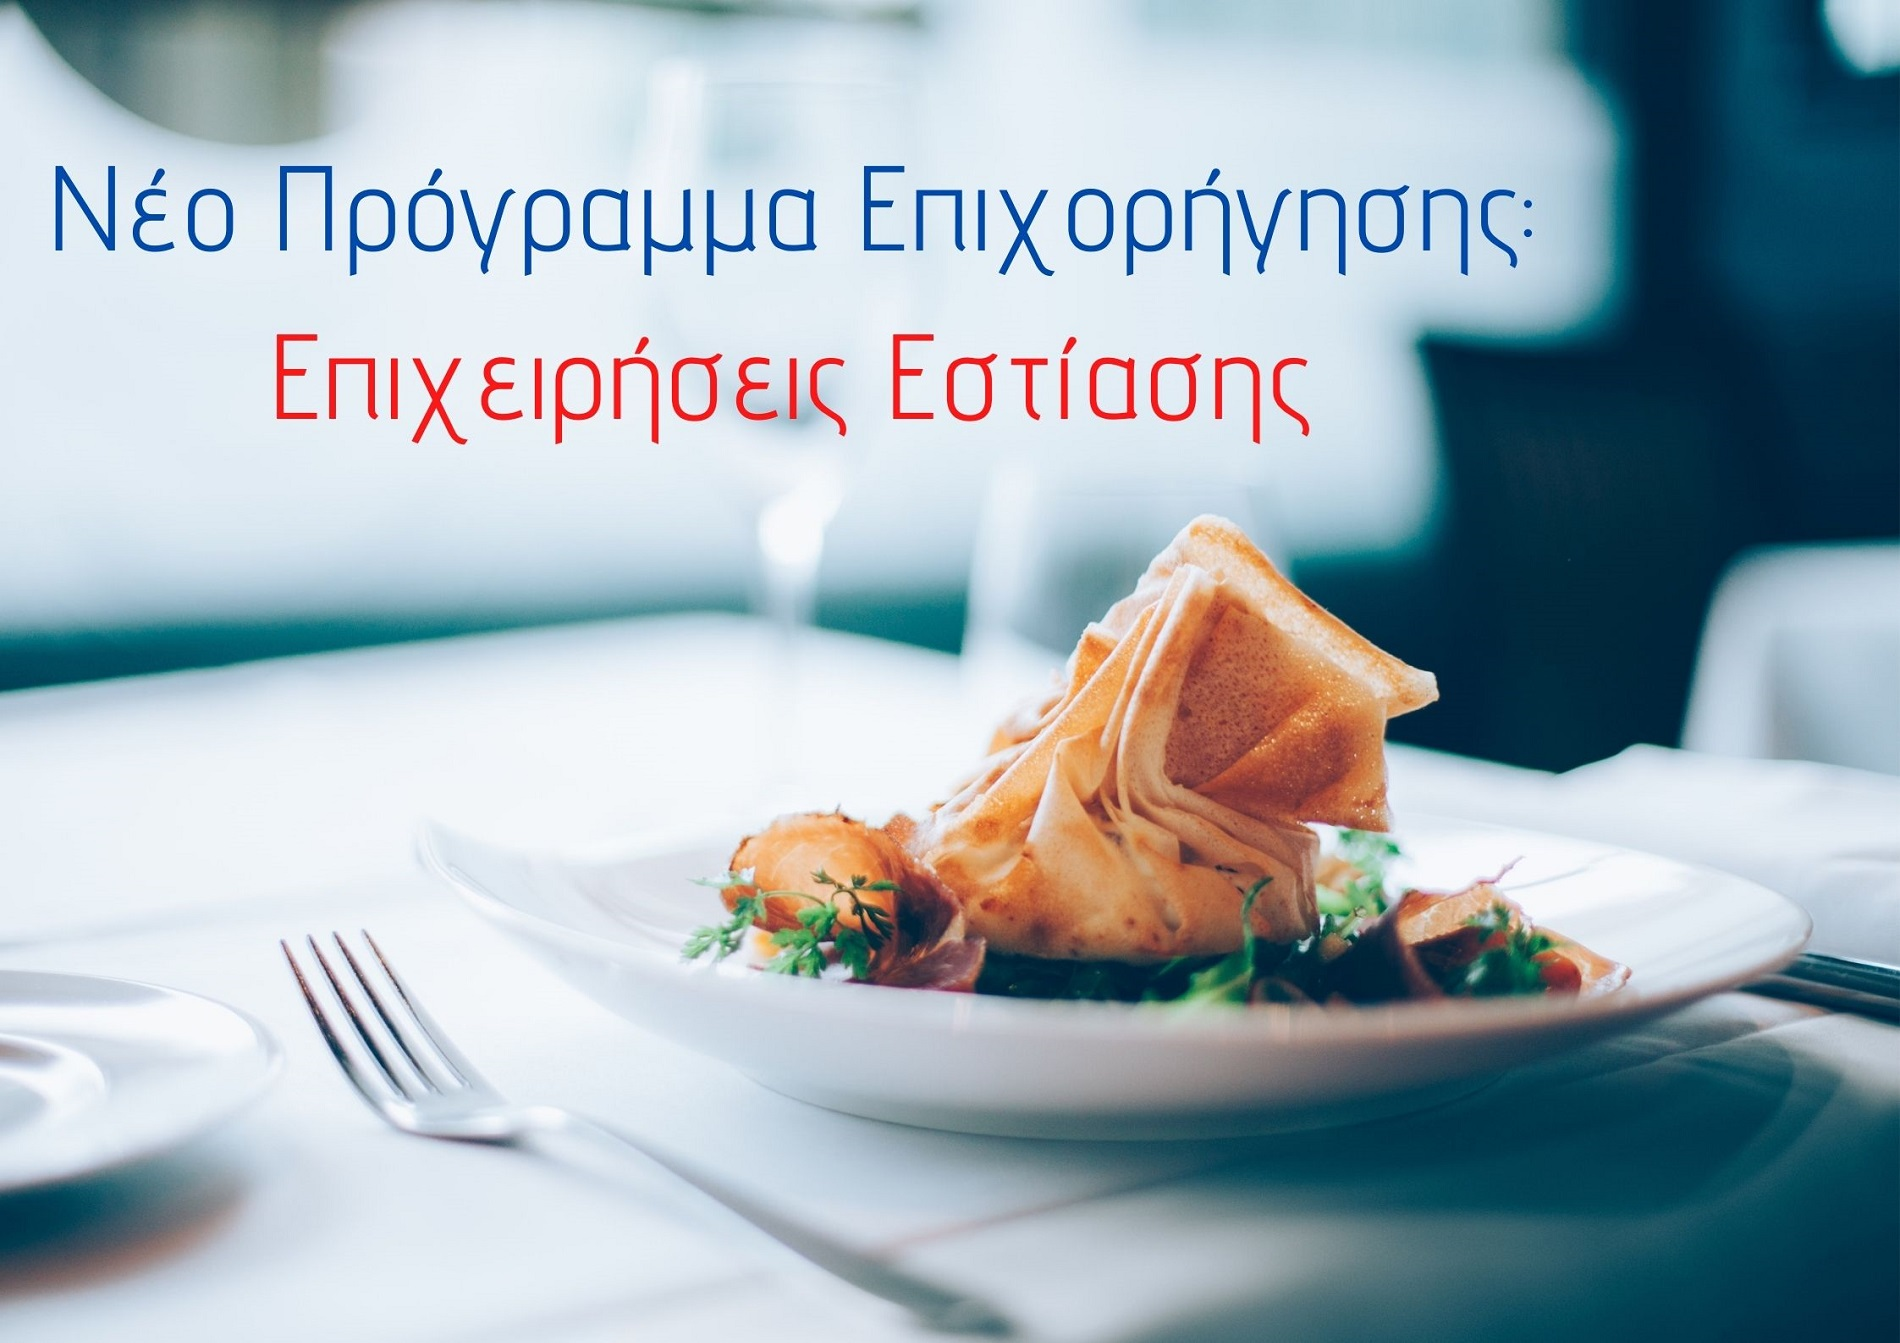 a-athlos.gr